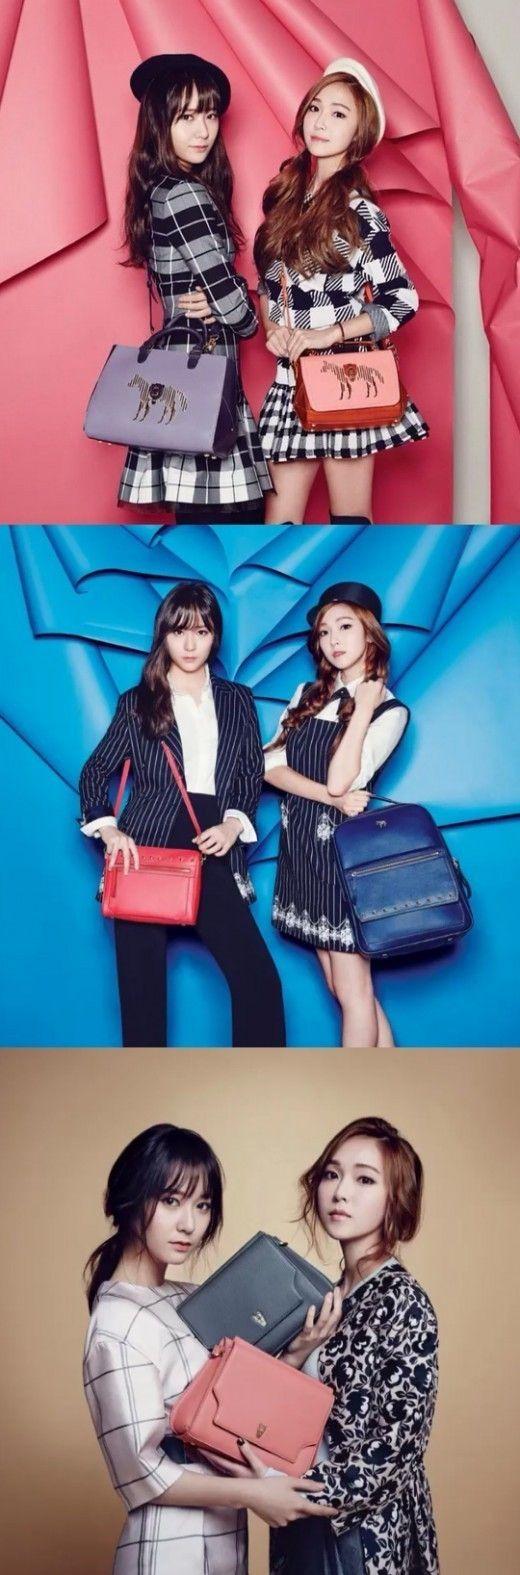 'Vogue Korea' unveils Jessica and Krystal's 'LAPALETTE' spring handbag pictorial   allkpop.com